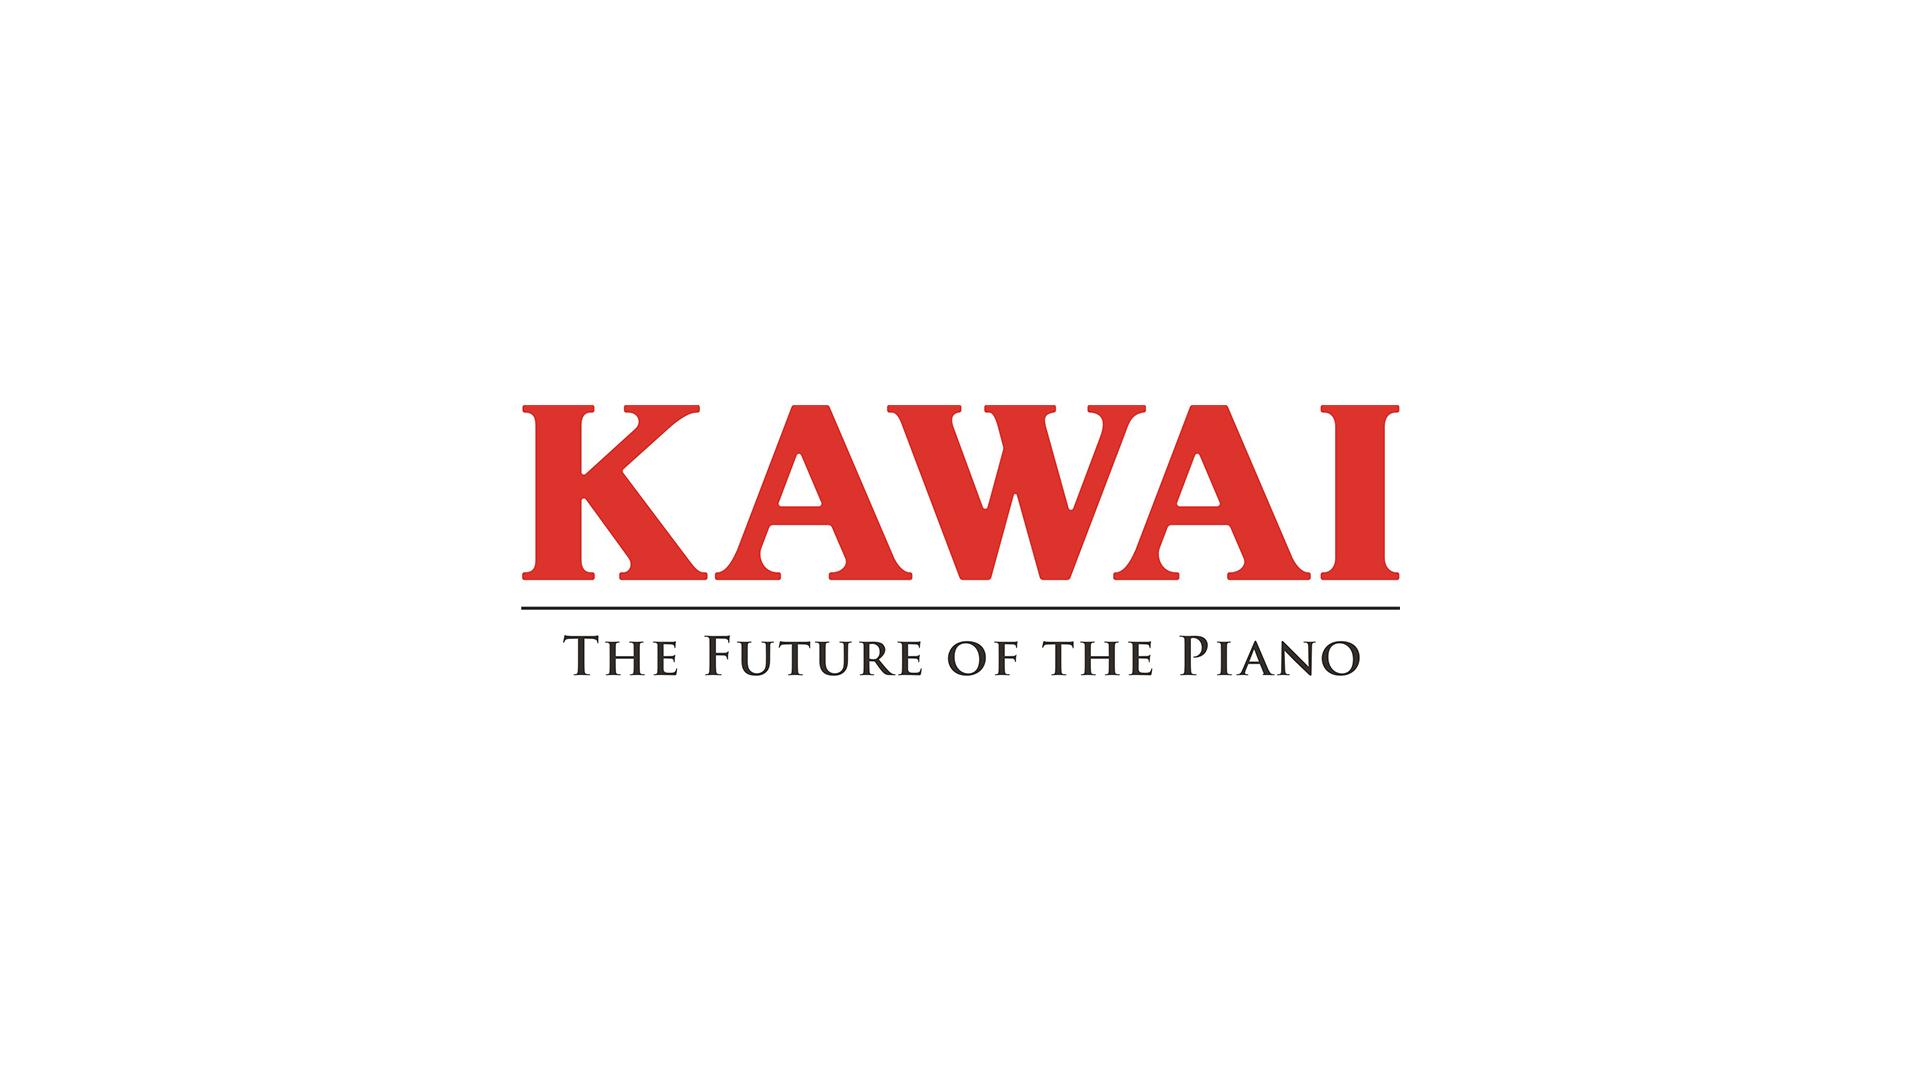 Kawai Pianos - Home